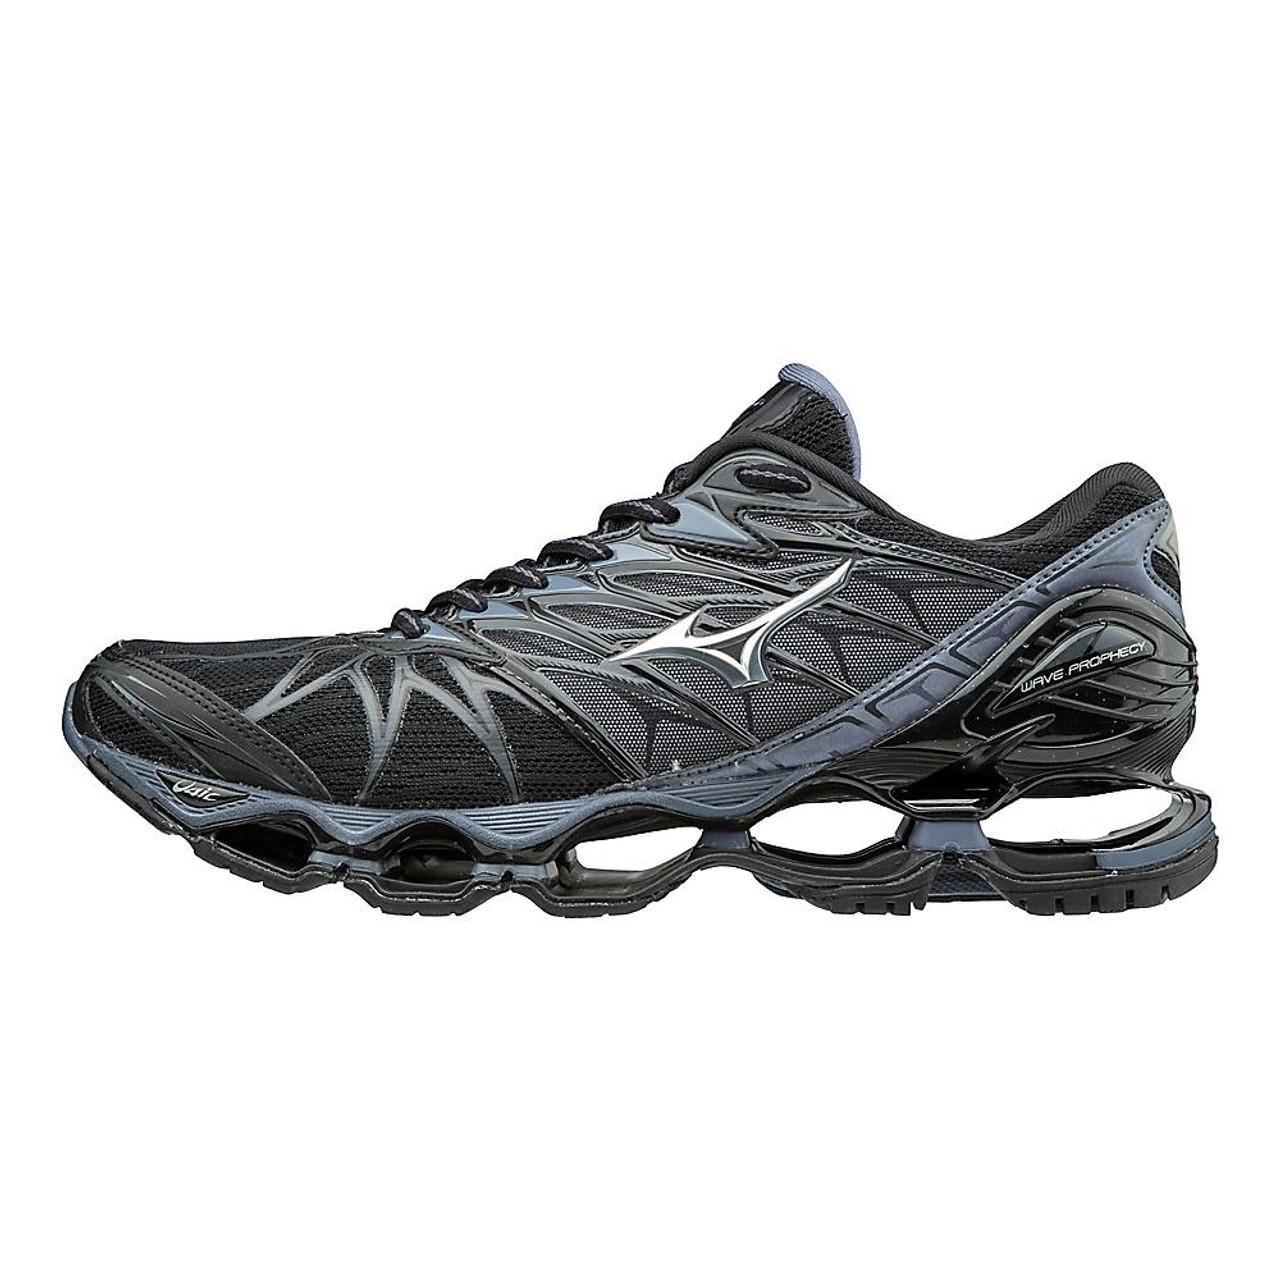 Men s Mizuno Wave Prophecy 7 Running Shoes  2a5b677c2